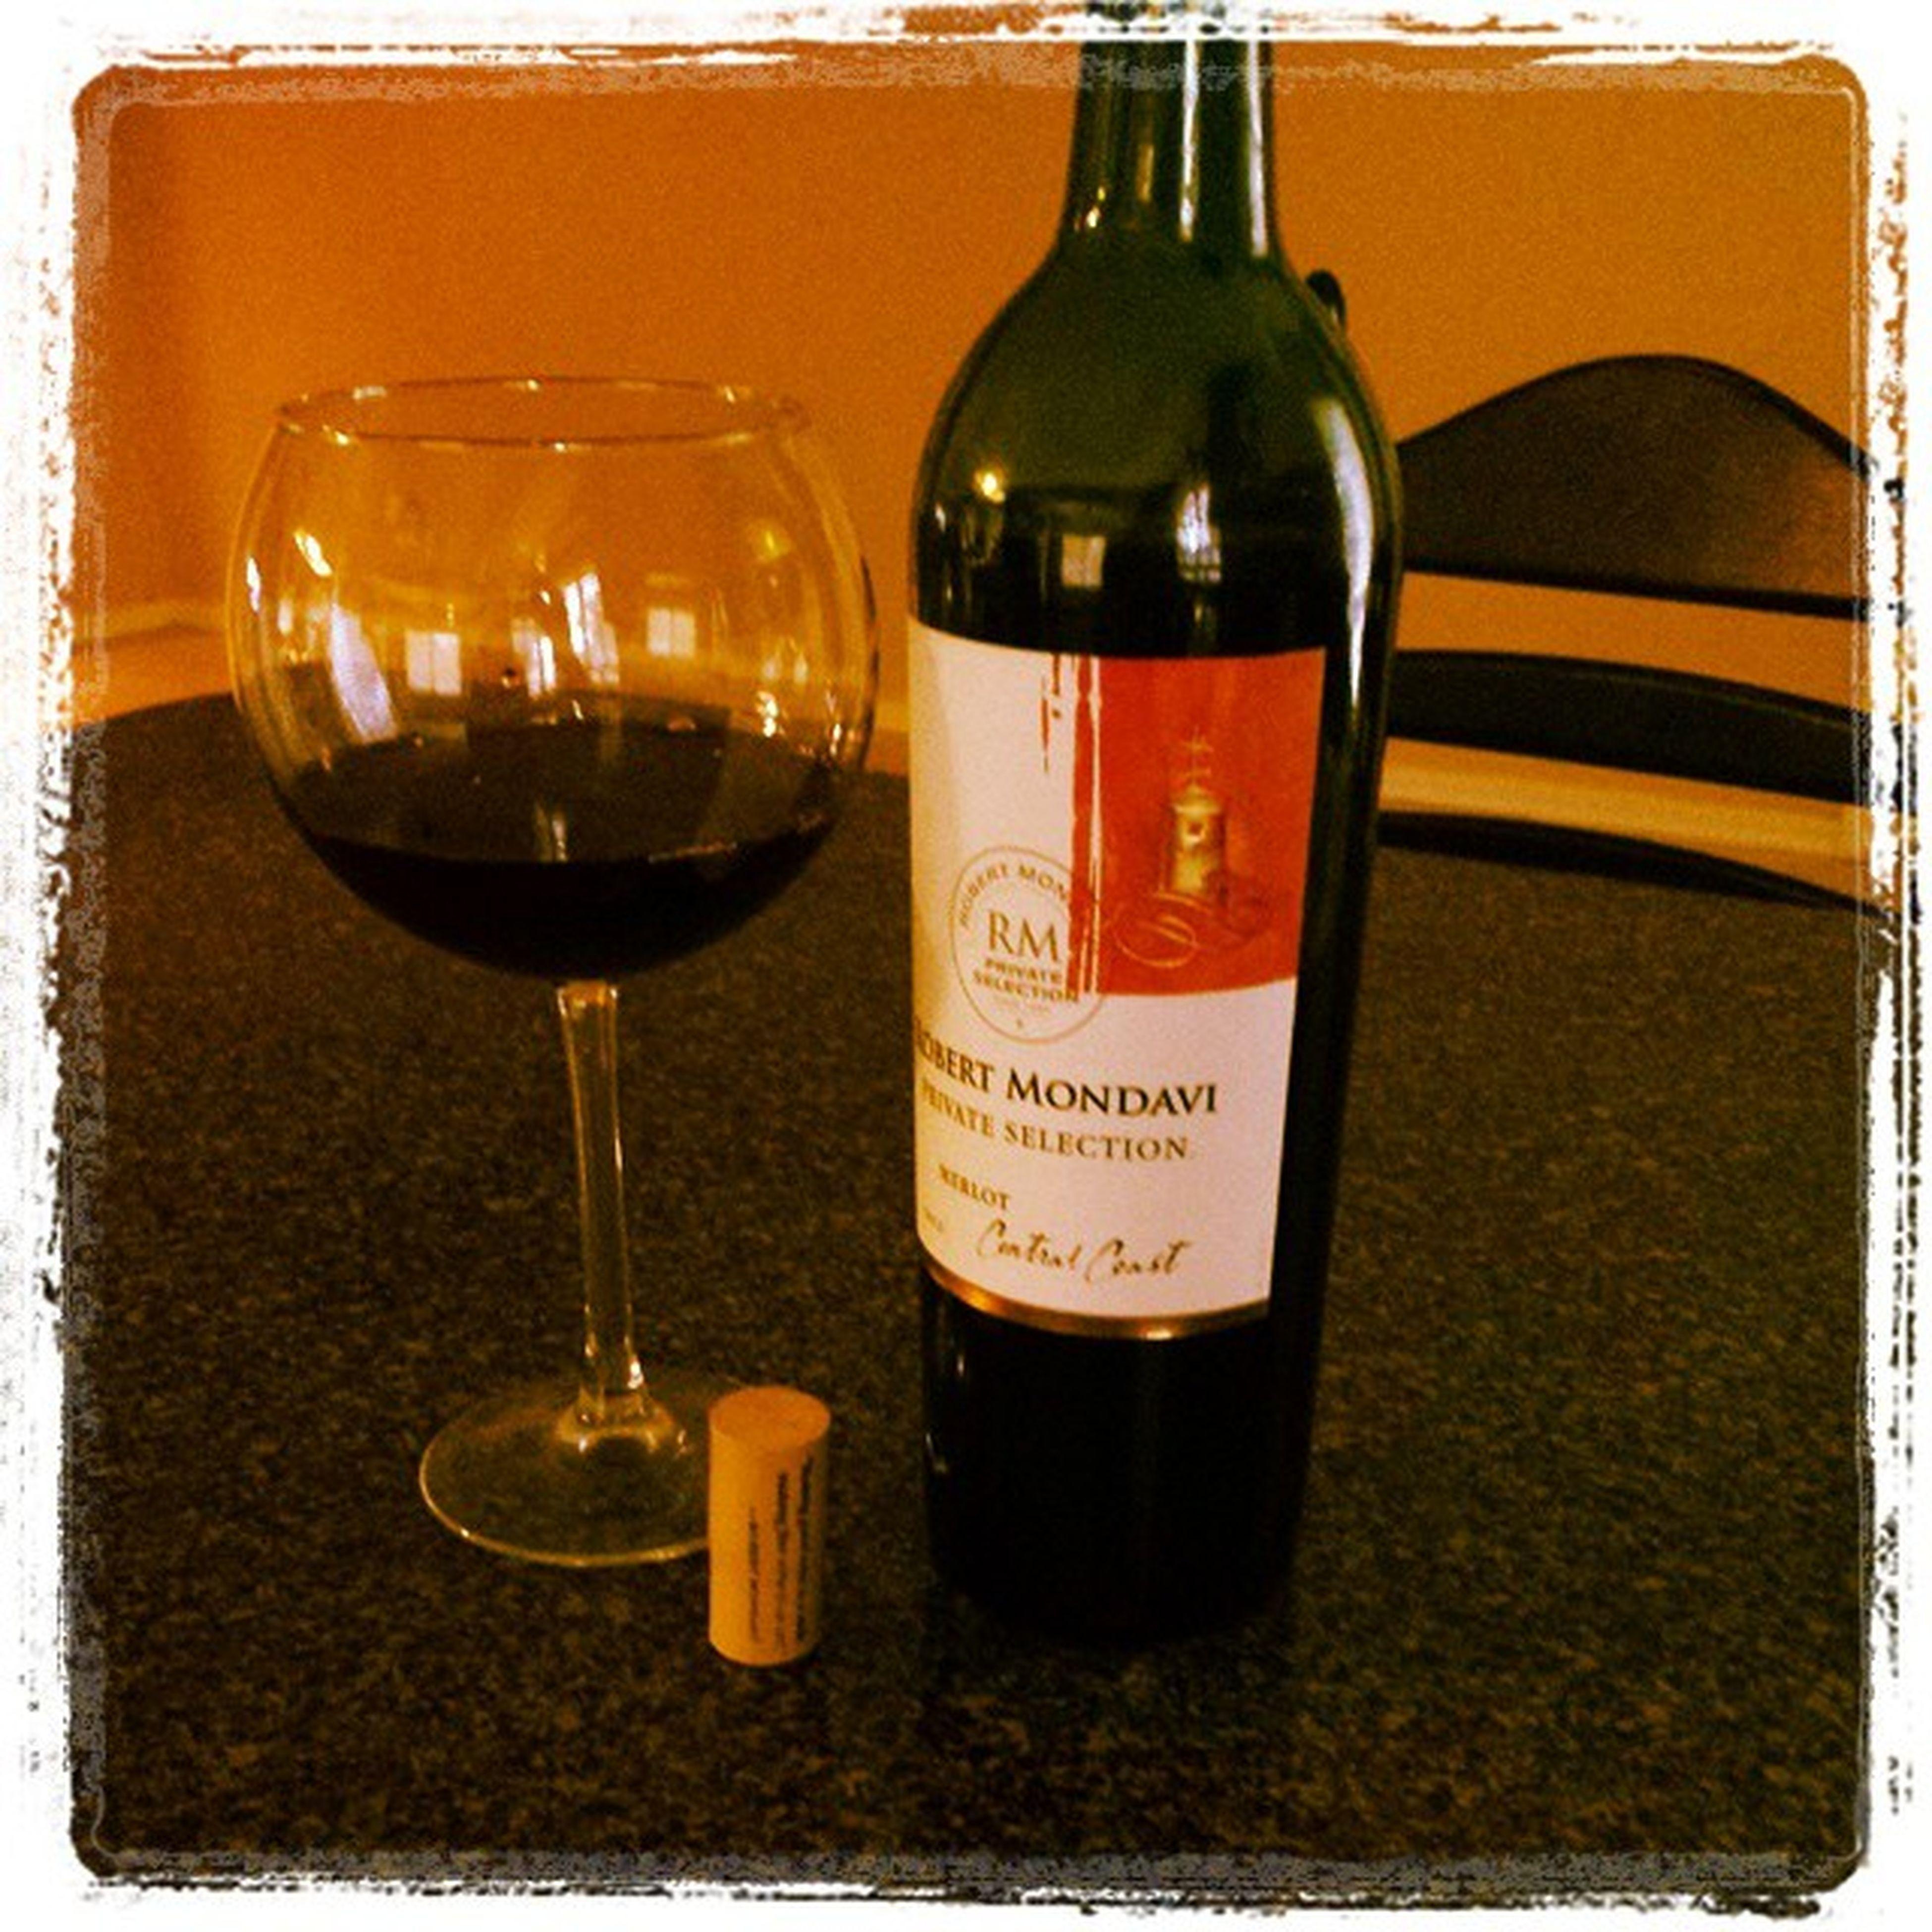 Mmm wine Robertmondavi Merlot